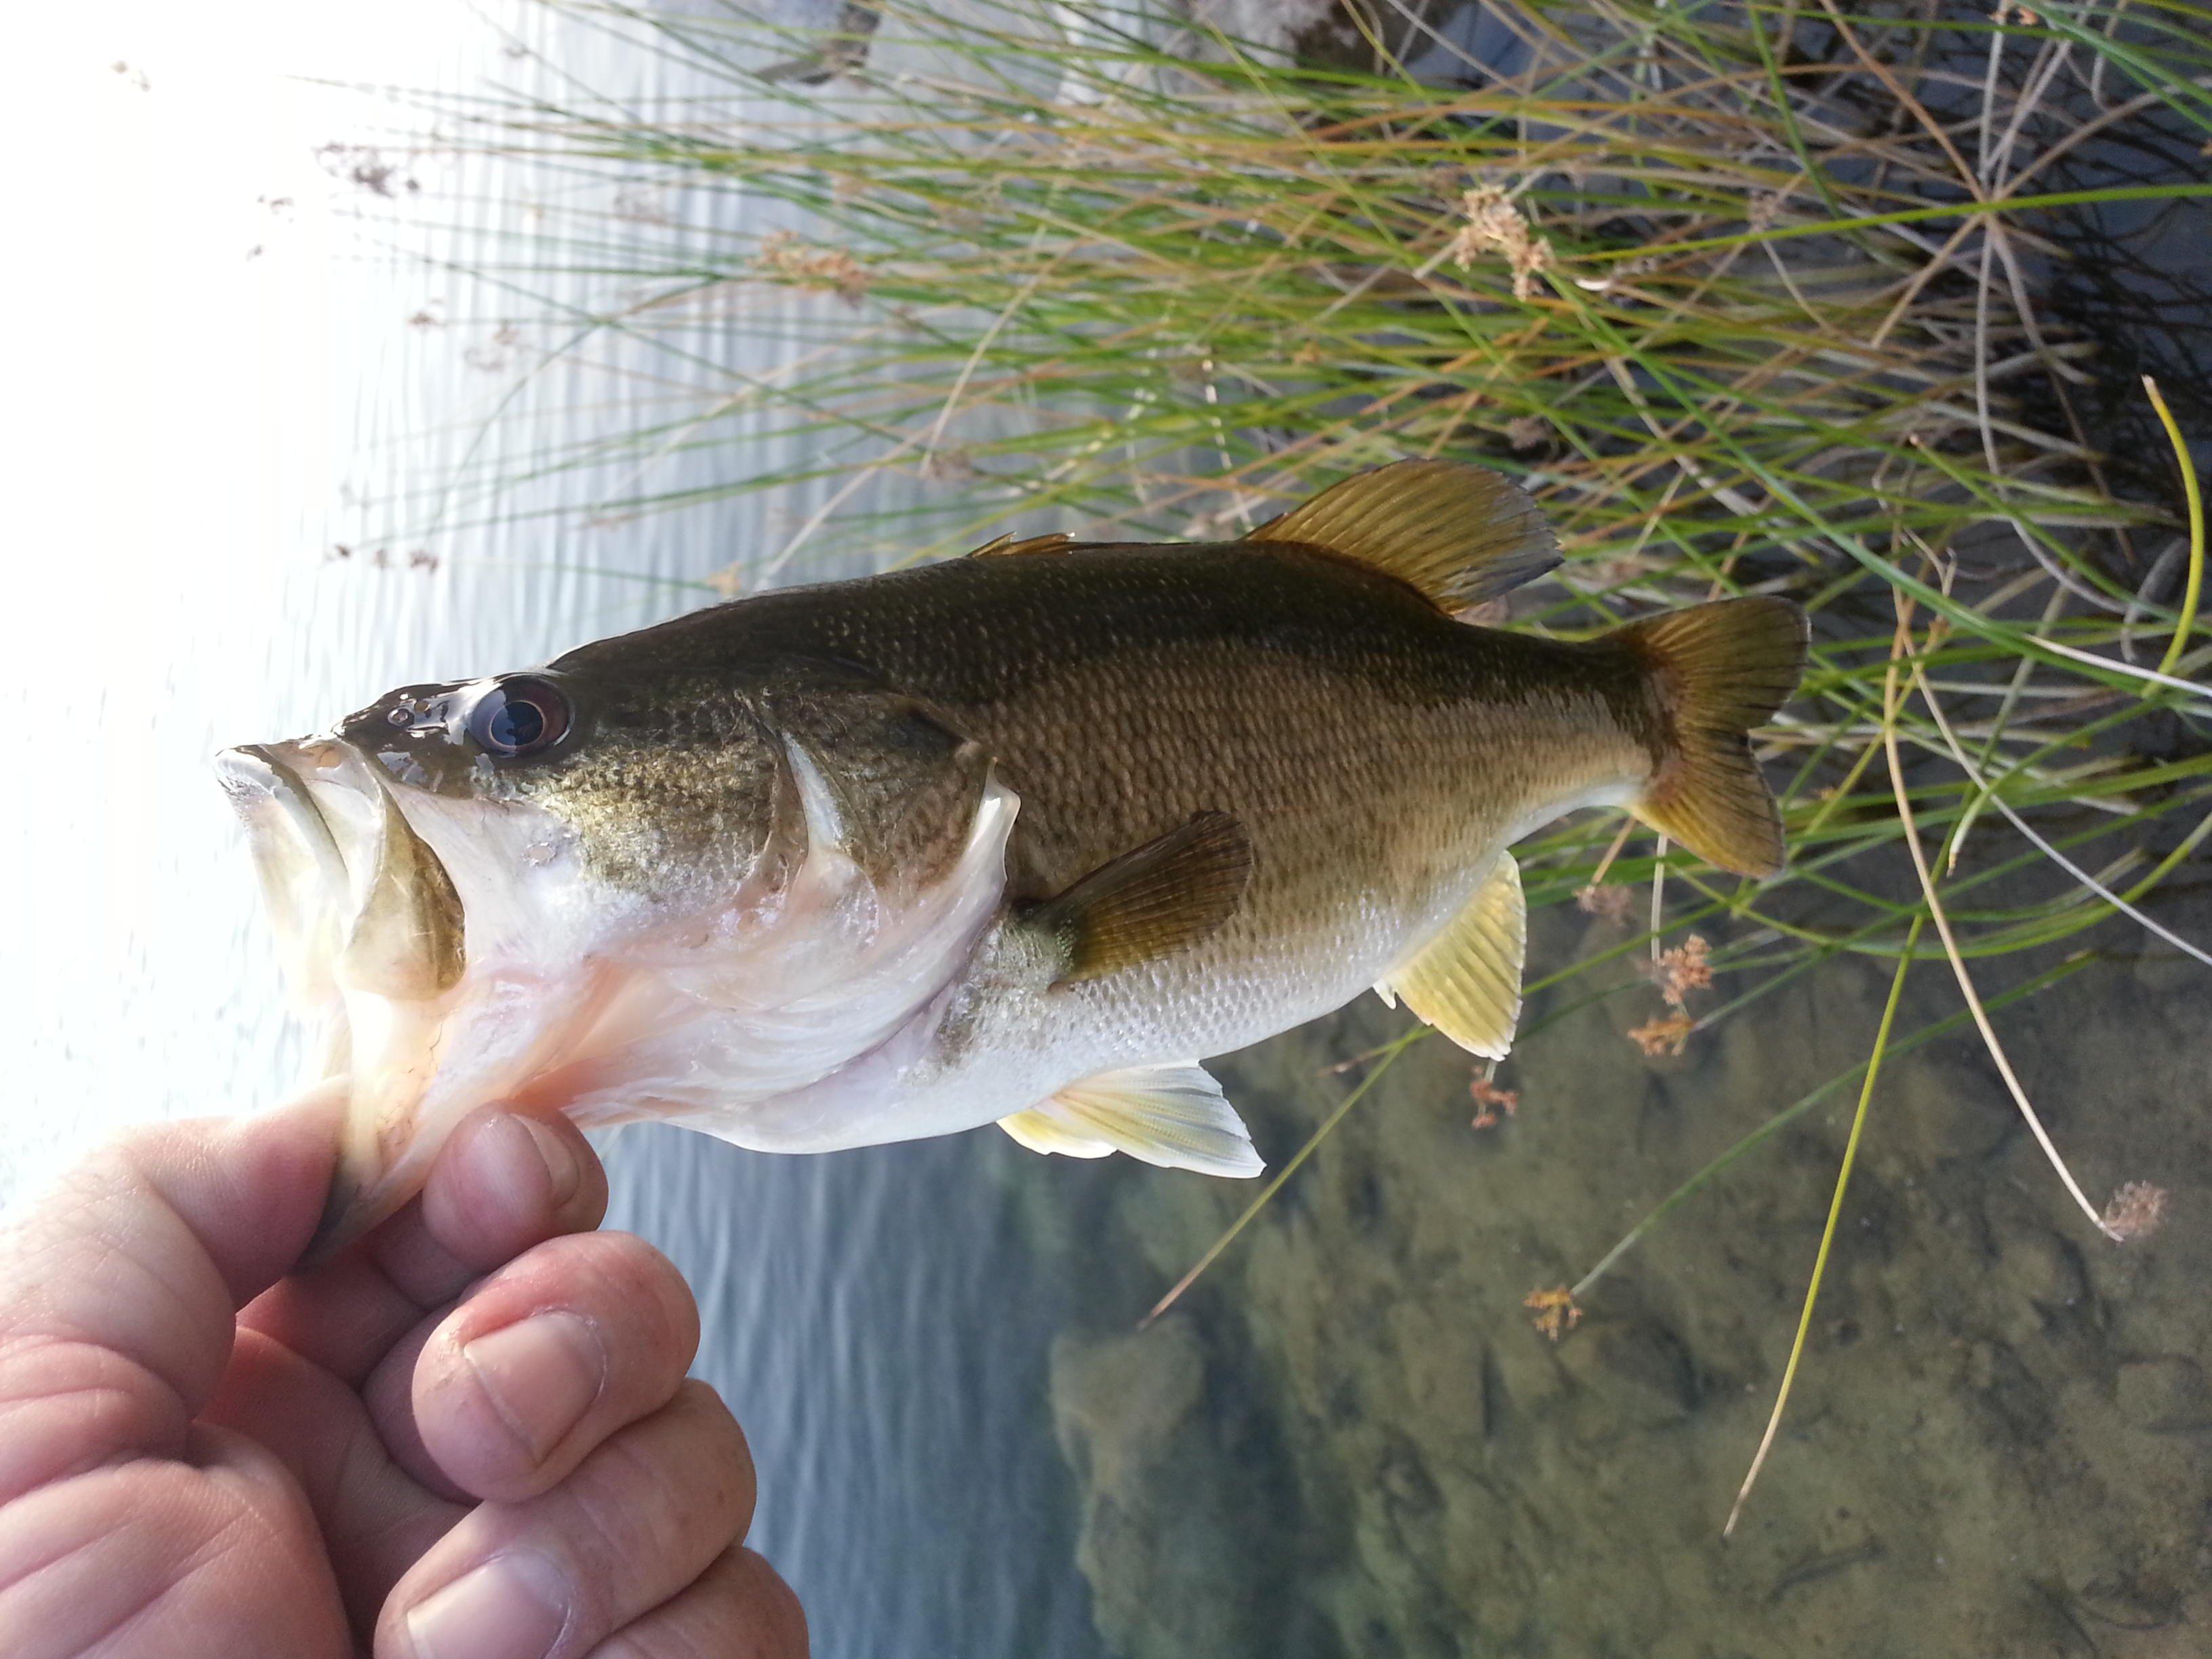 Click image for larger version  Name:bass 3-18-14 dixon lake #2.jpg Views:381 Size:625.7 KB ID:51641